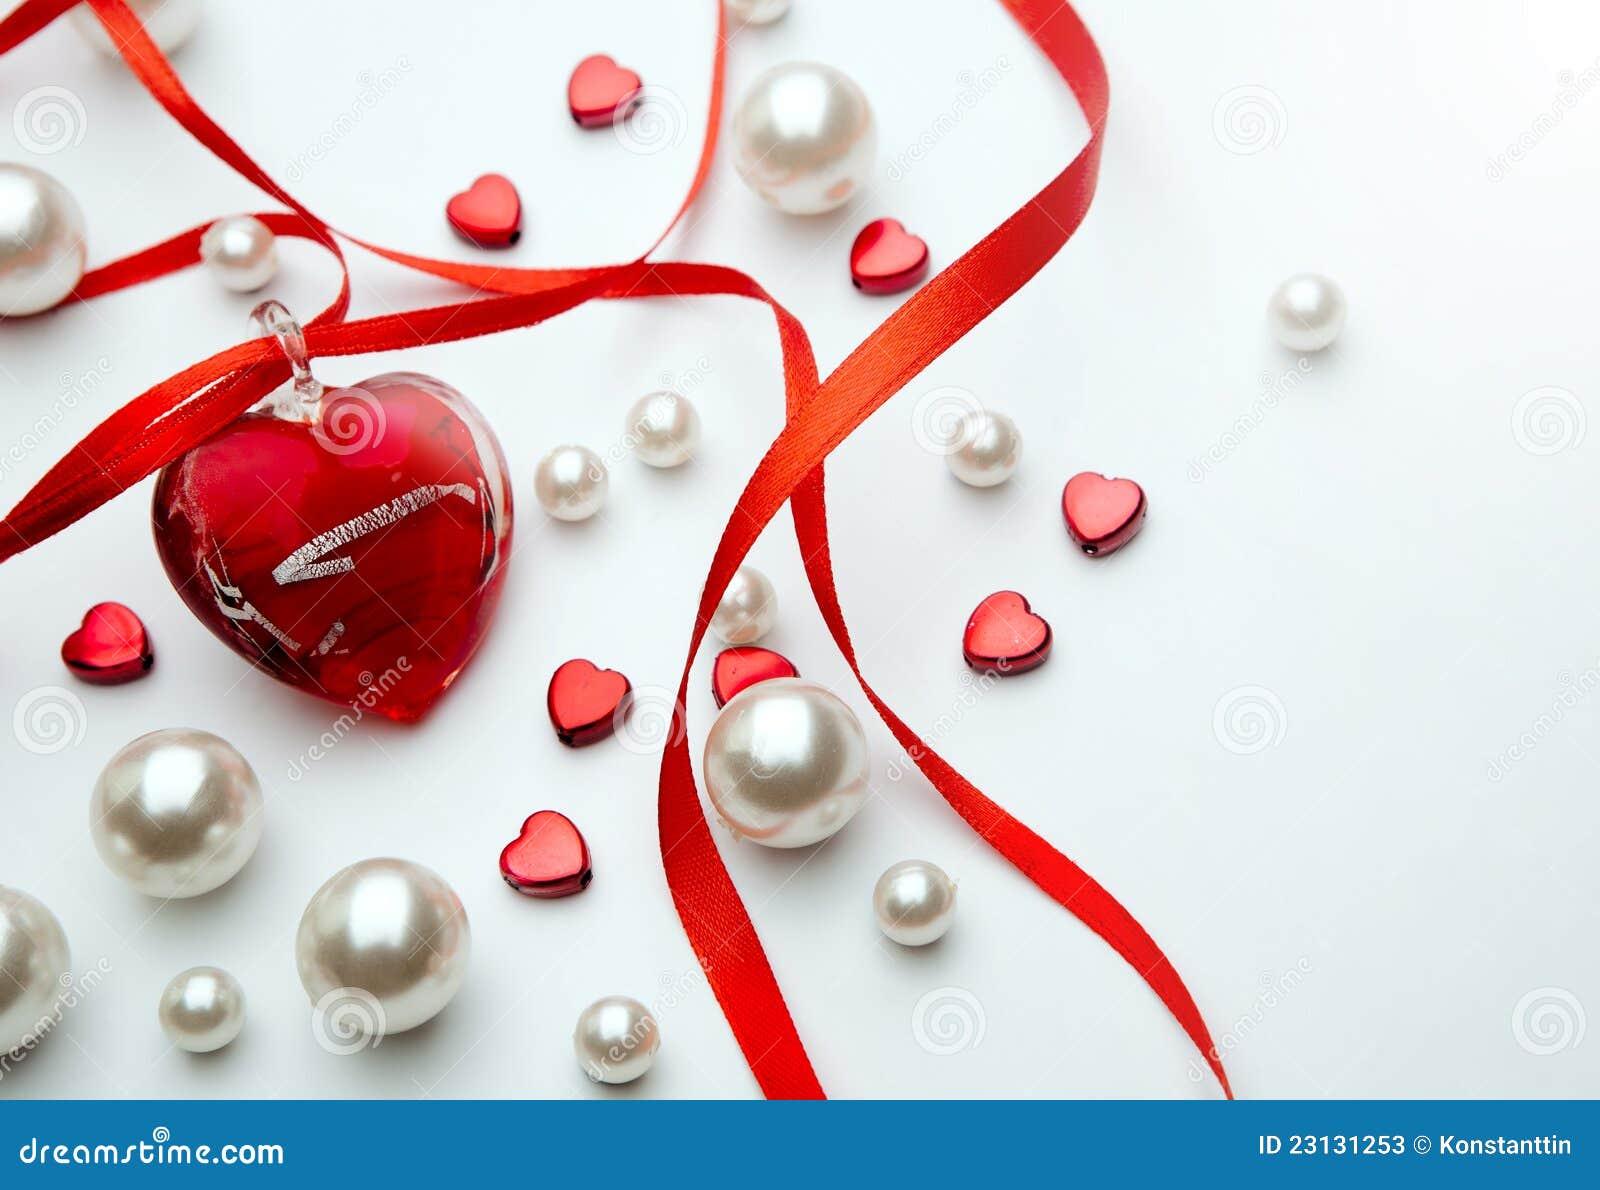 Art Valentine Day Stock Photos Image 23131253